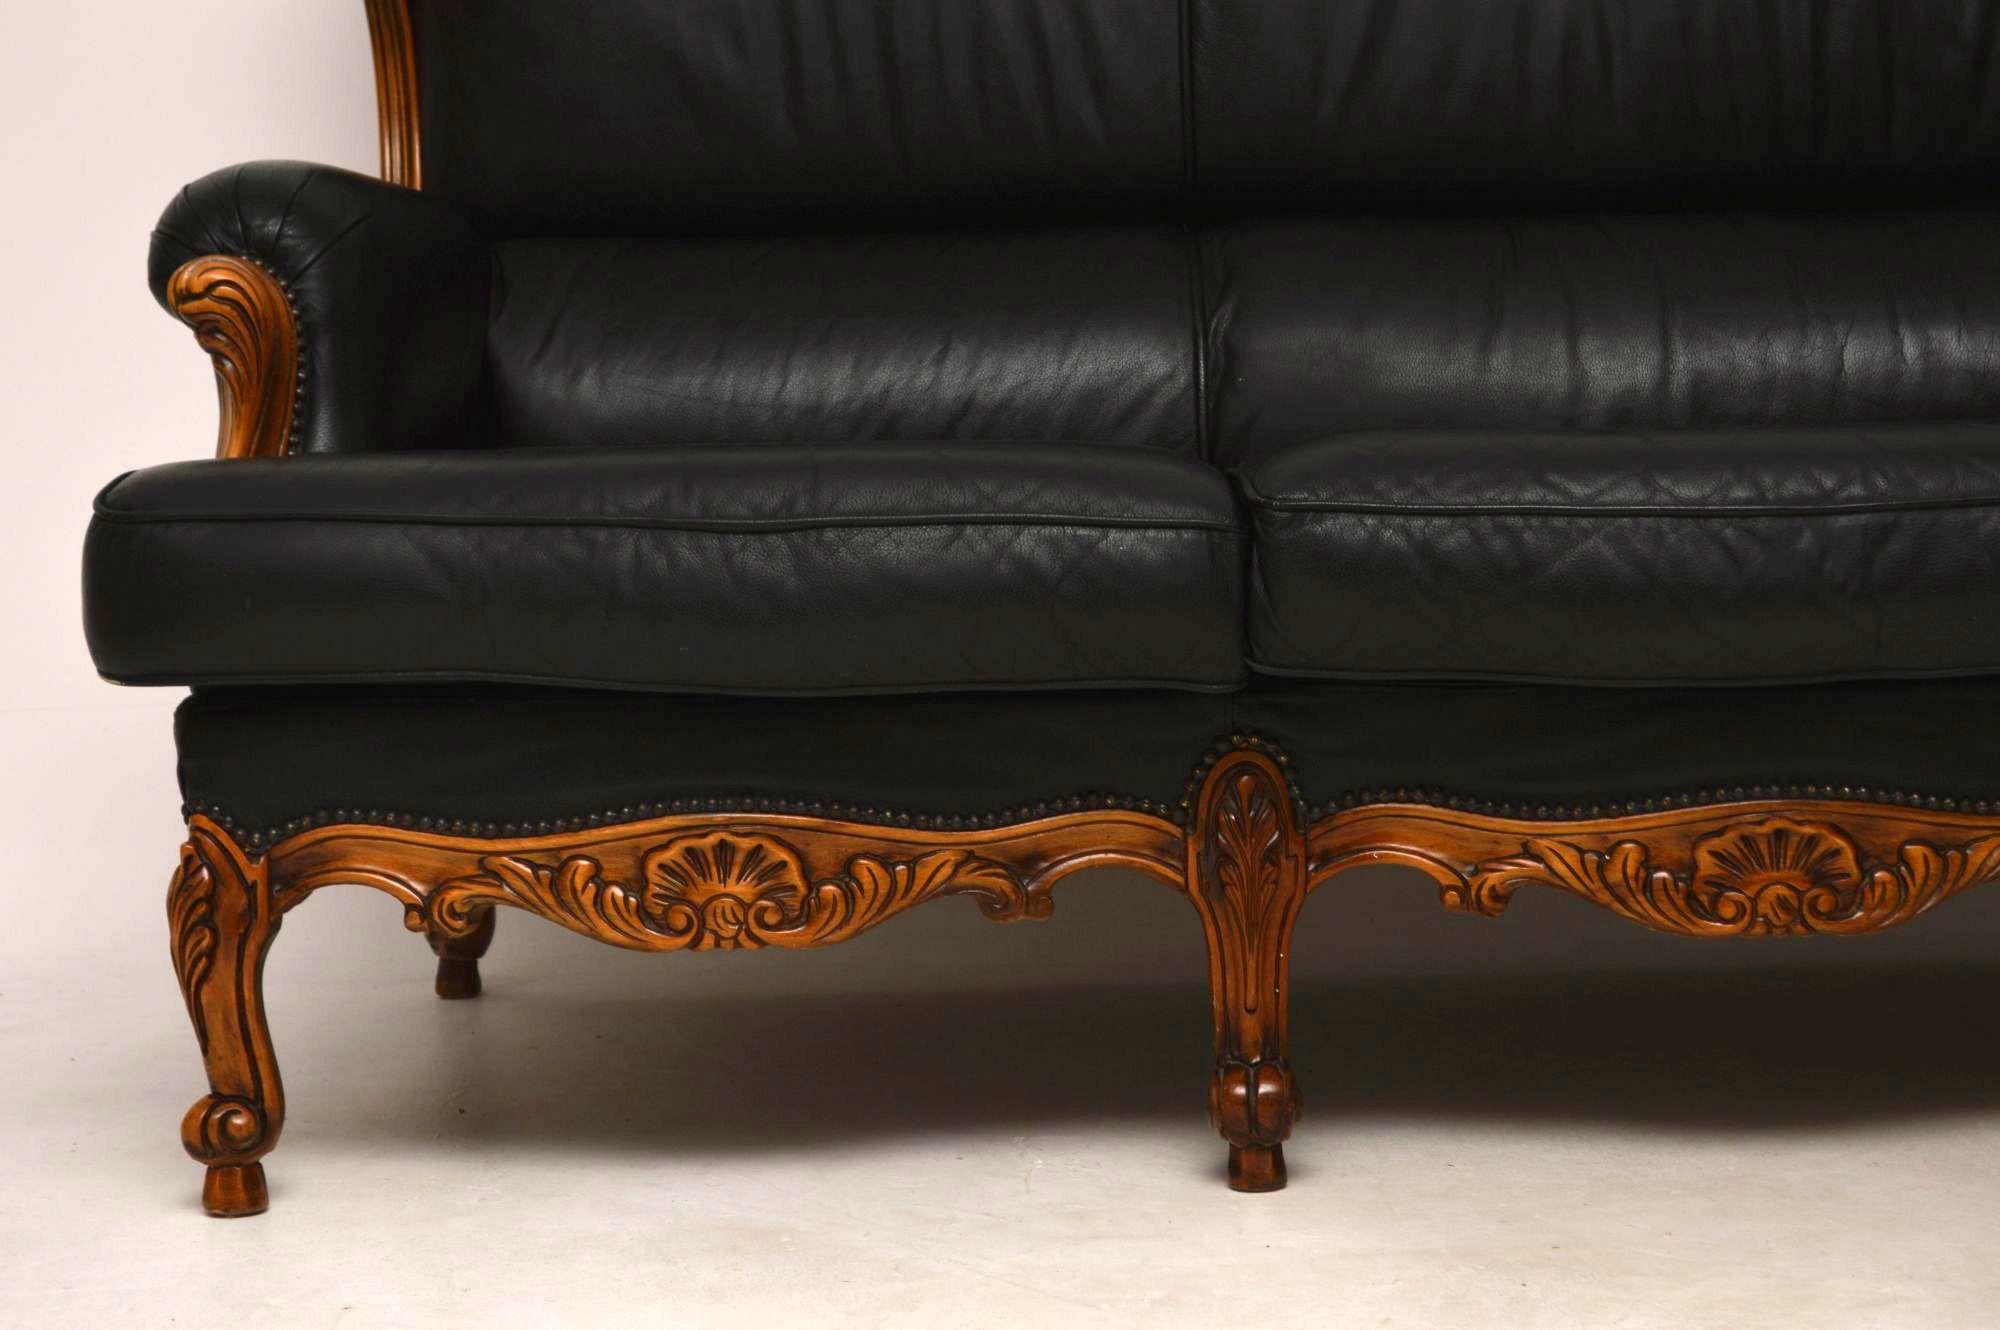 antique french sofa ebay sfar vintage 20th century in damask